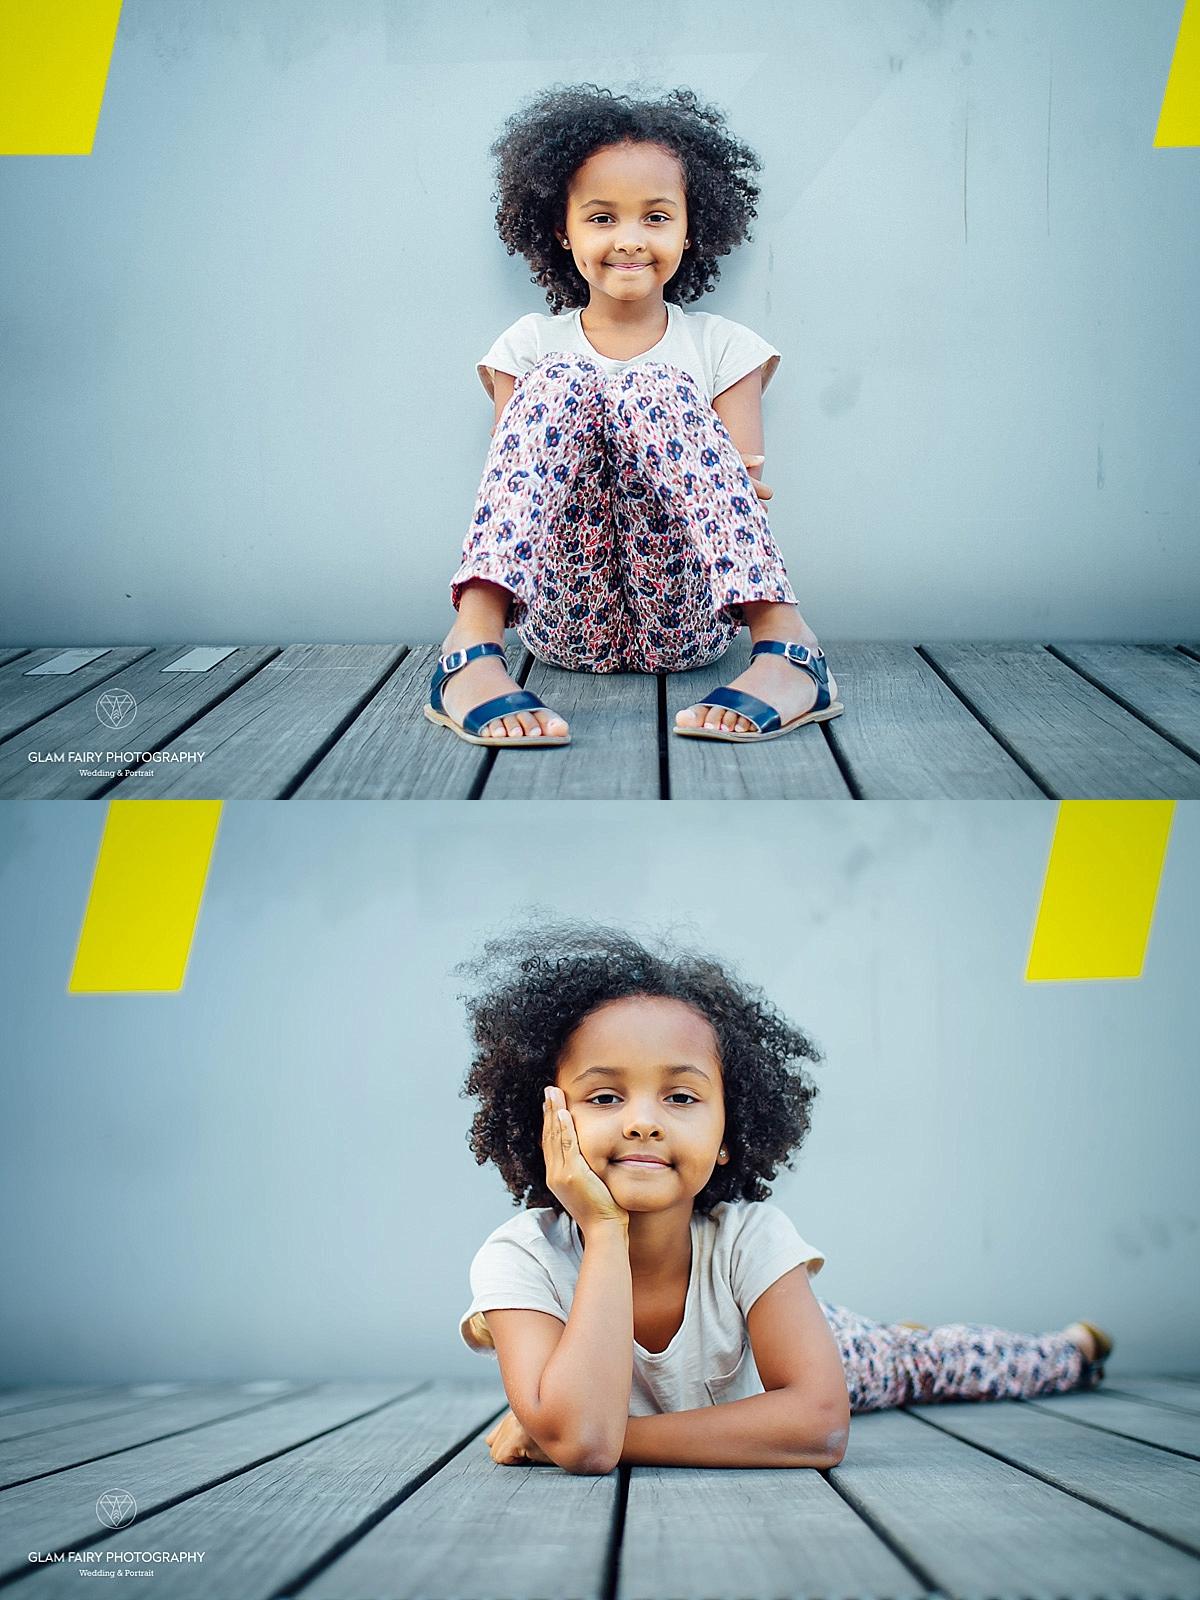 GlamFairyPhotography-séance-photo-enfant-bnf-yaelle_0004